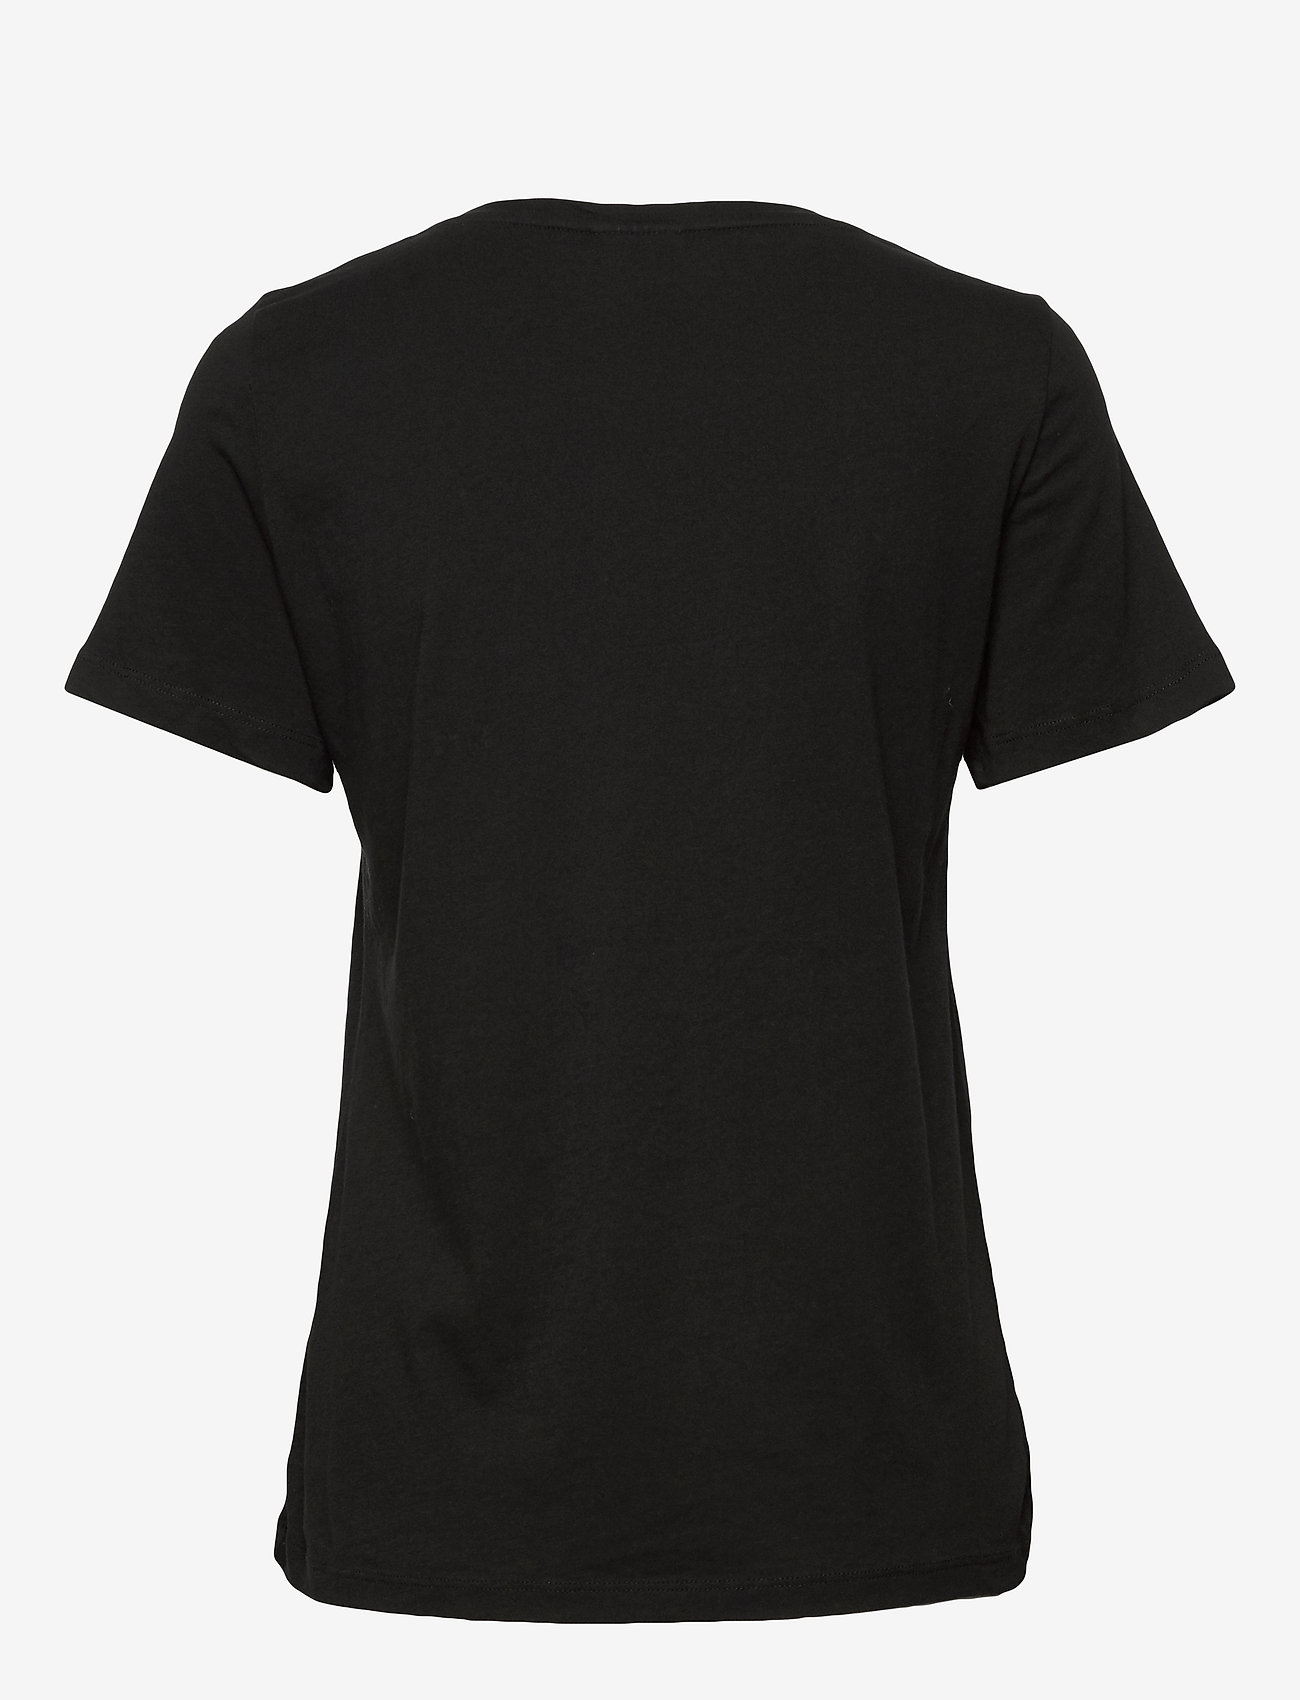 Vila - VISUS O-NECK S/S T-SHIRT/SU - NOOS - t-shirts - black - 1